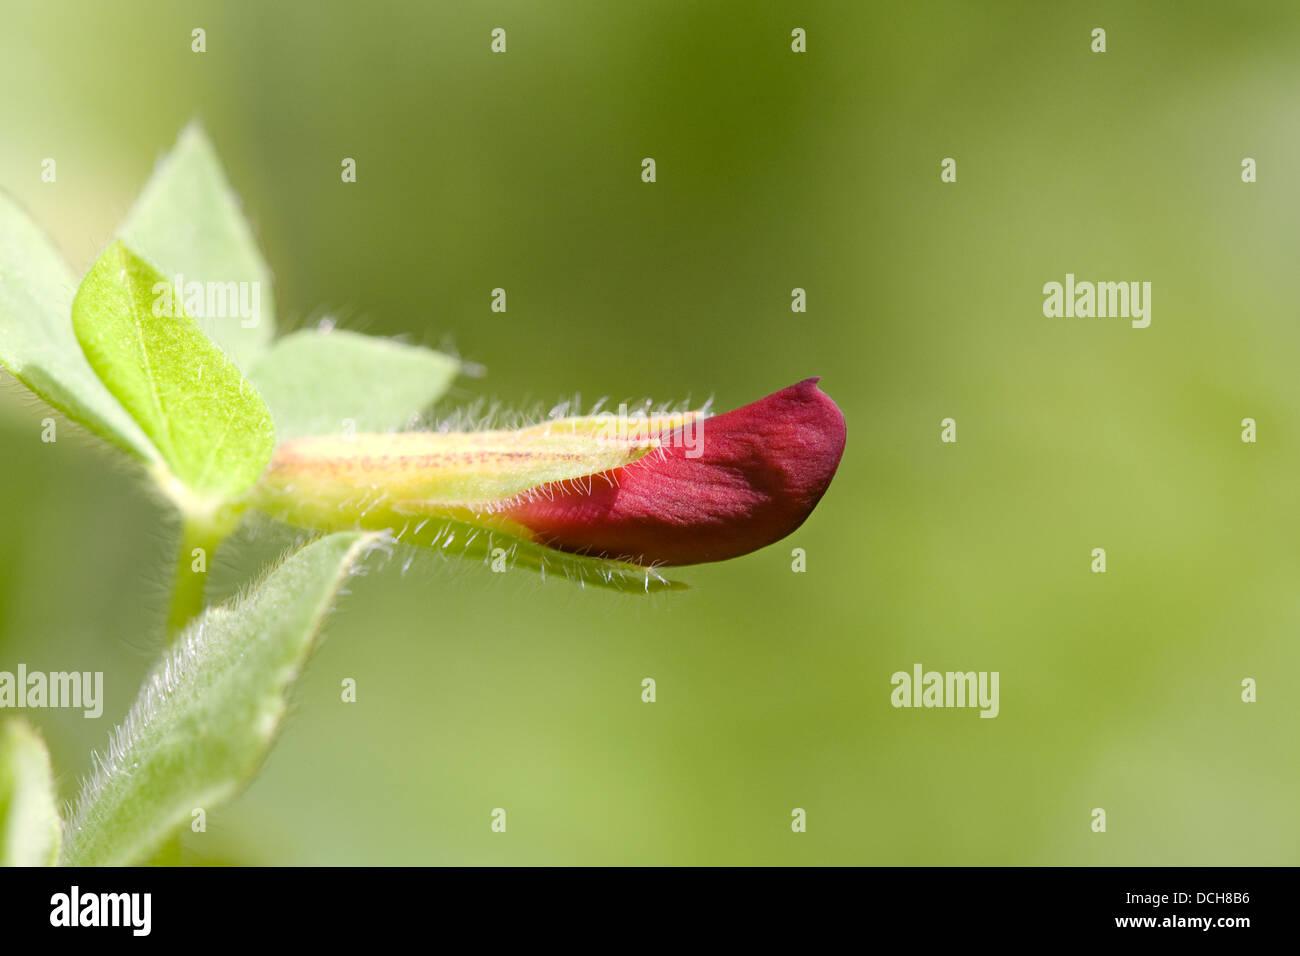 Lotus tetragonolobus, syn. Tetragonolobus purpurea. Asparagus pea flower. - Stock Image